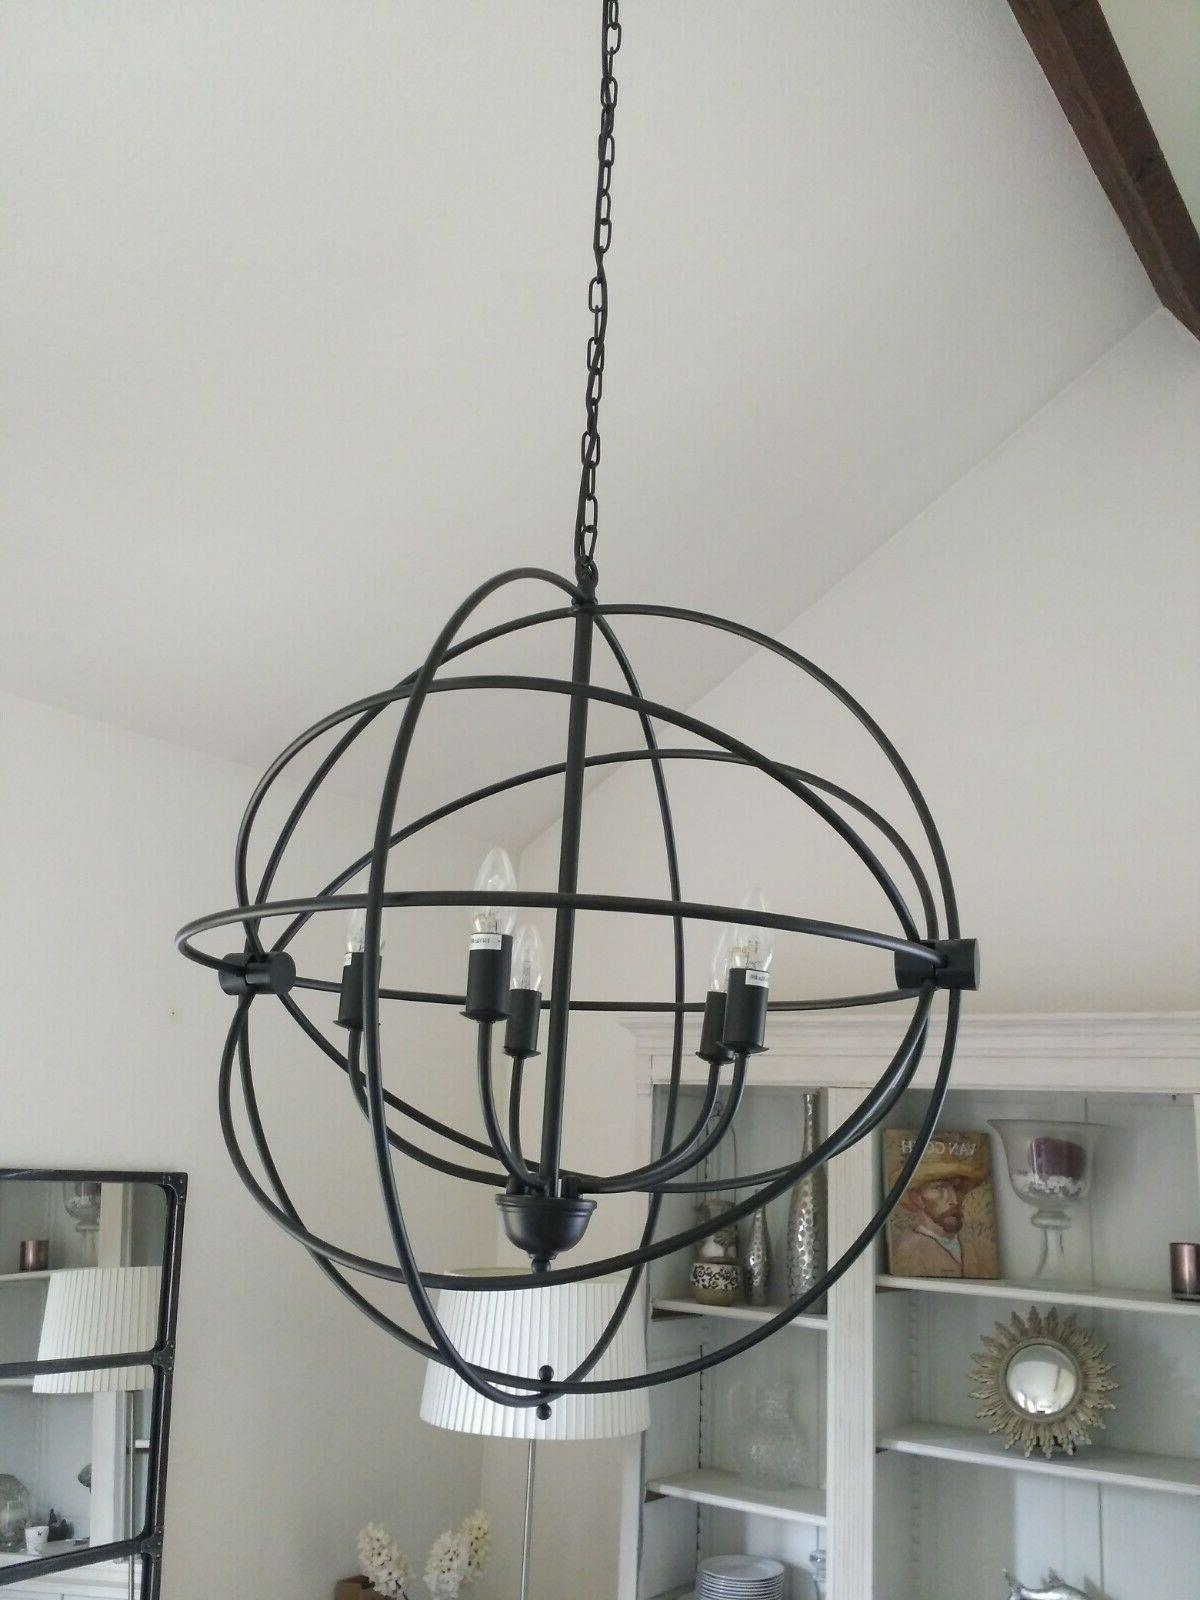 suspension lustre luminaire lampe plafonnier spherique circu